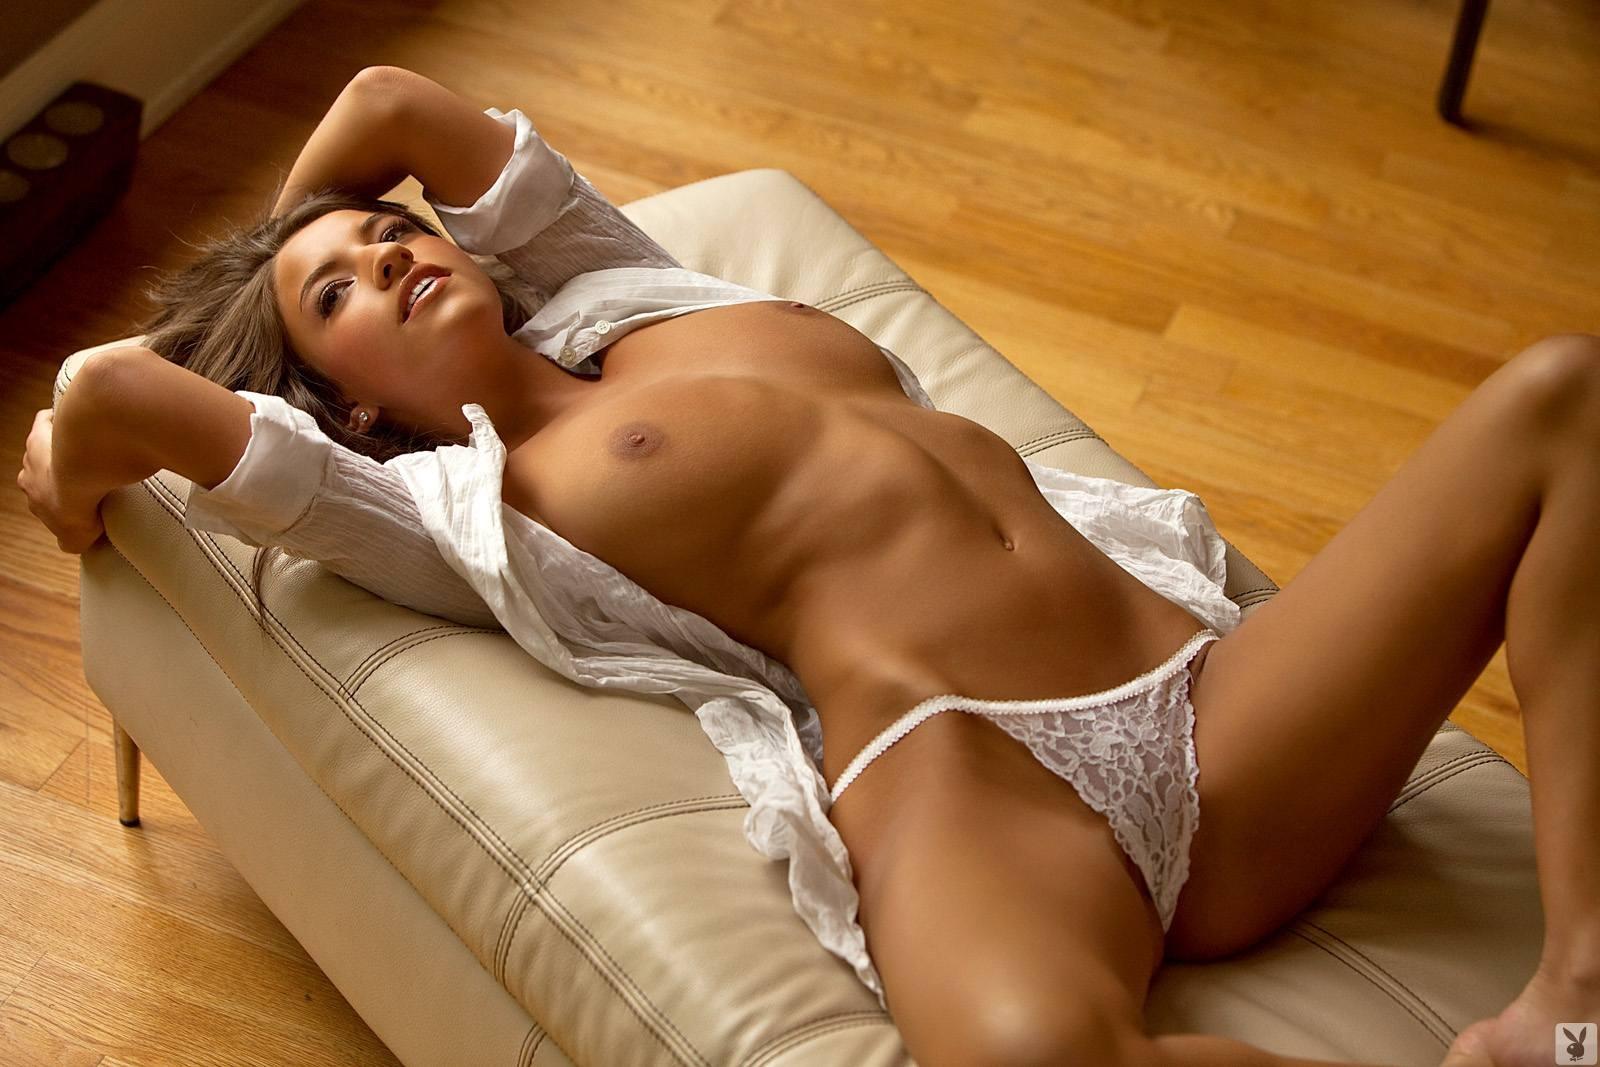 Selena gomez's sexy new photo looks like an underwear commercial